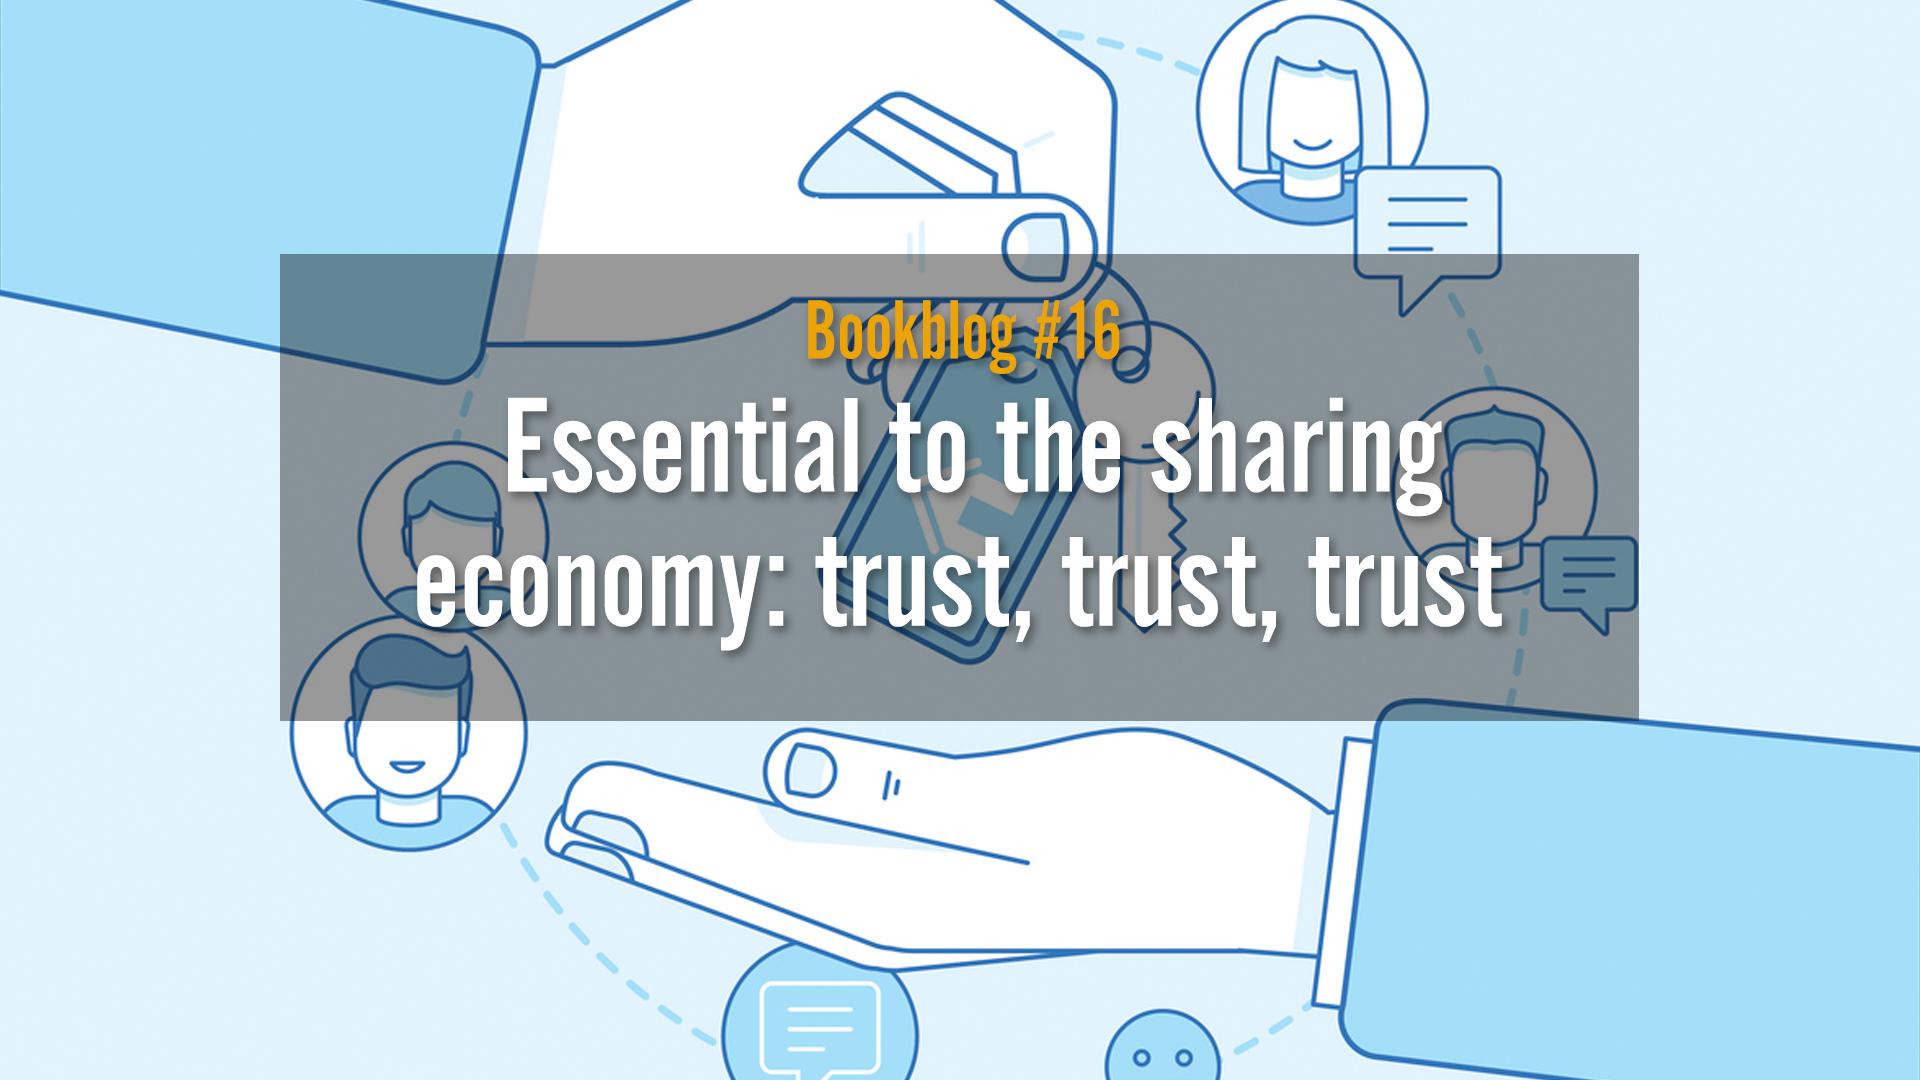 Essential to the sharing economy: trust, trust, trust